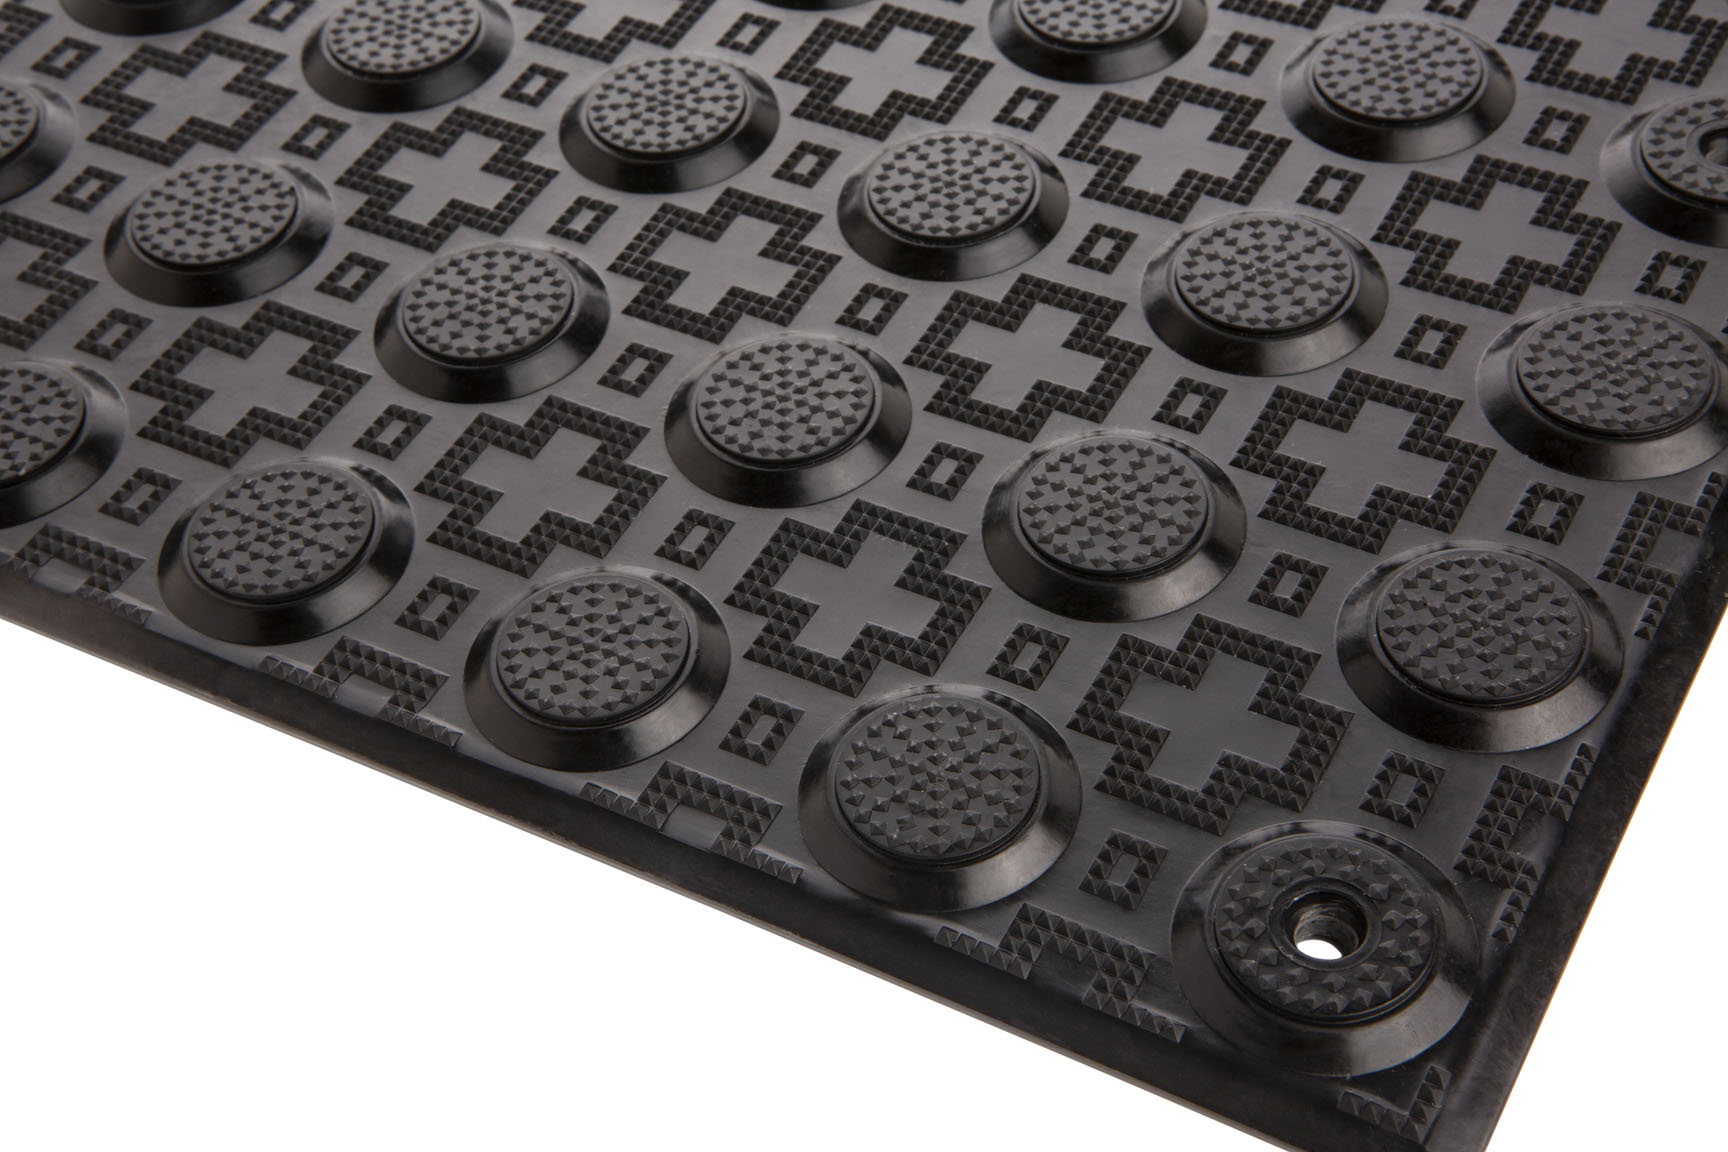 PTBSA600 - Black  Fibreglass Reinforced Polymer Tactiles - Perth Tactiles